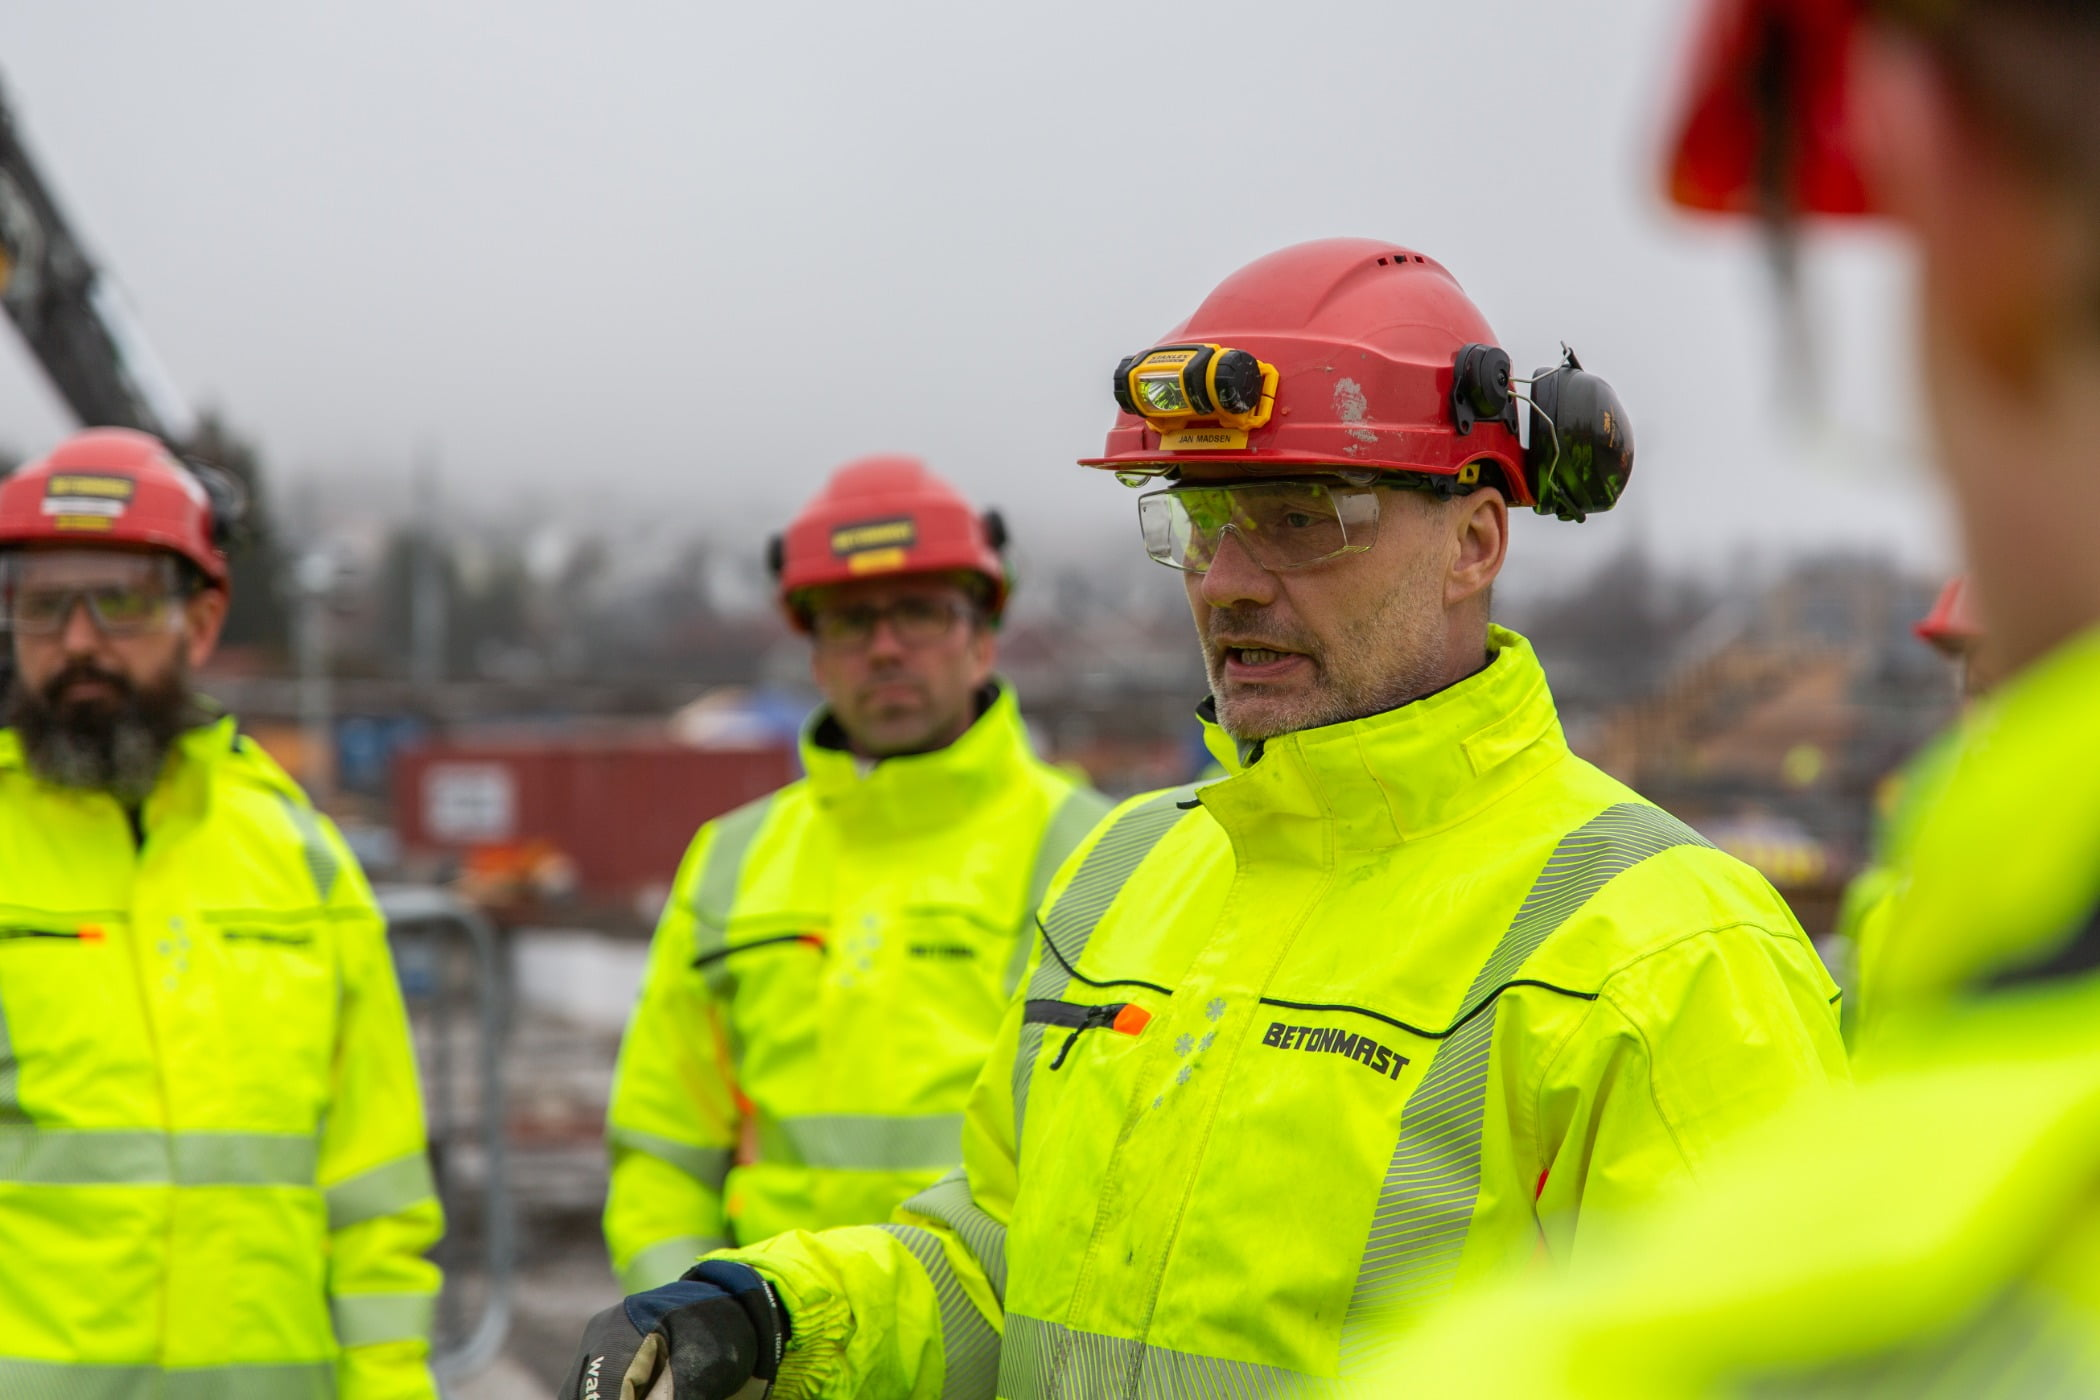 Hard hat, High-visibility clothing, Blue-collar worker, Workwear, Helmet, Plant, Engineer, Tree